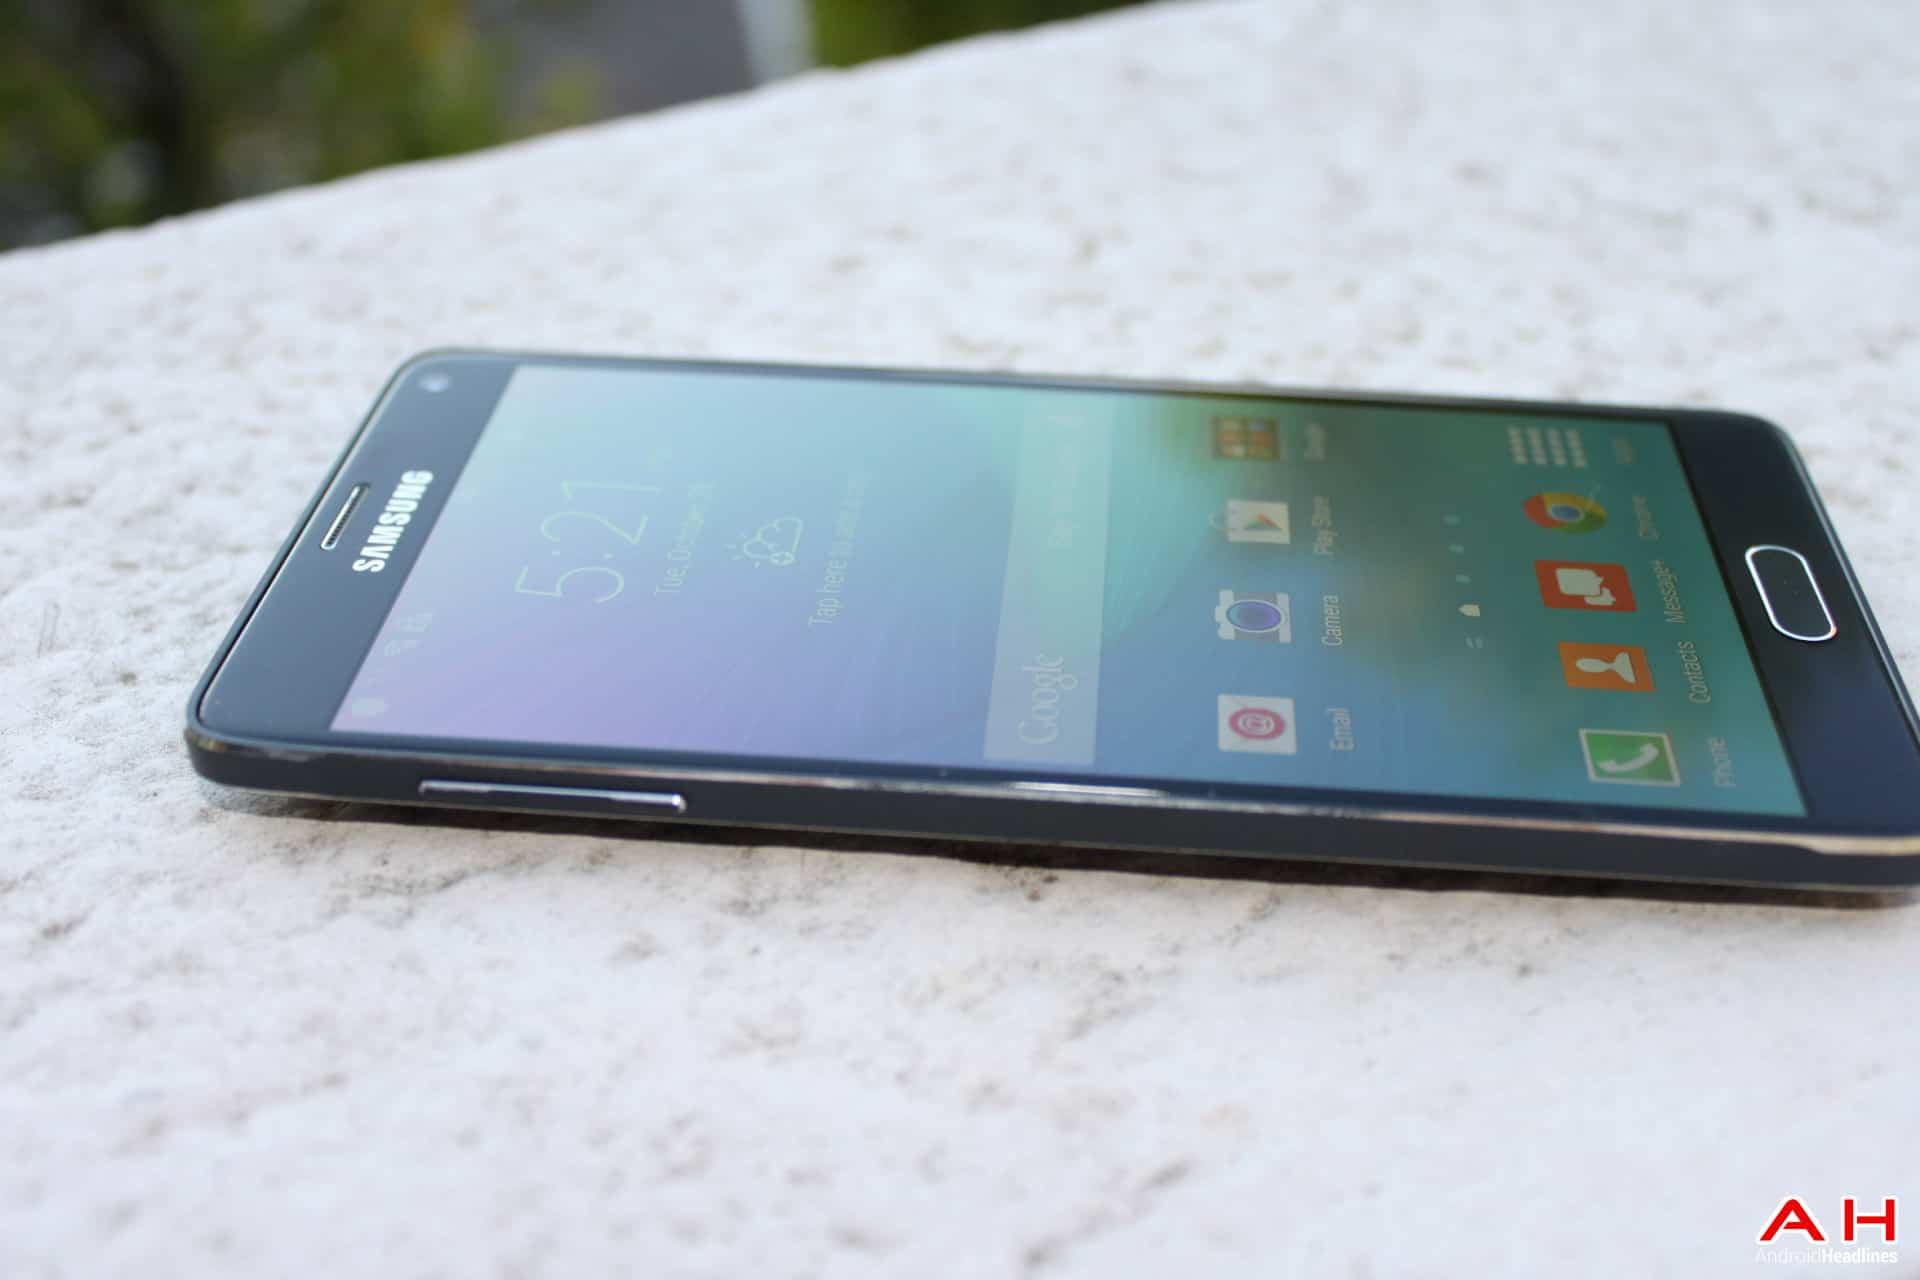 AH Samsung Galaxy Note 4 25